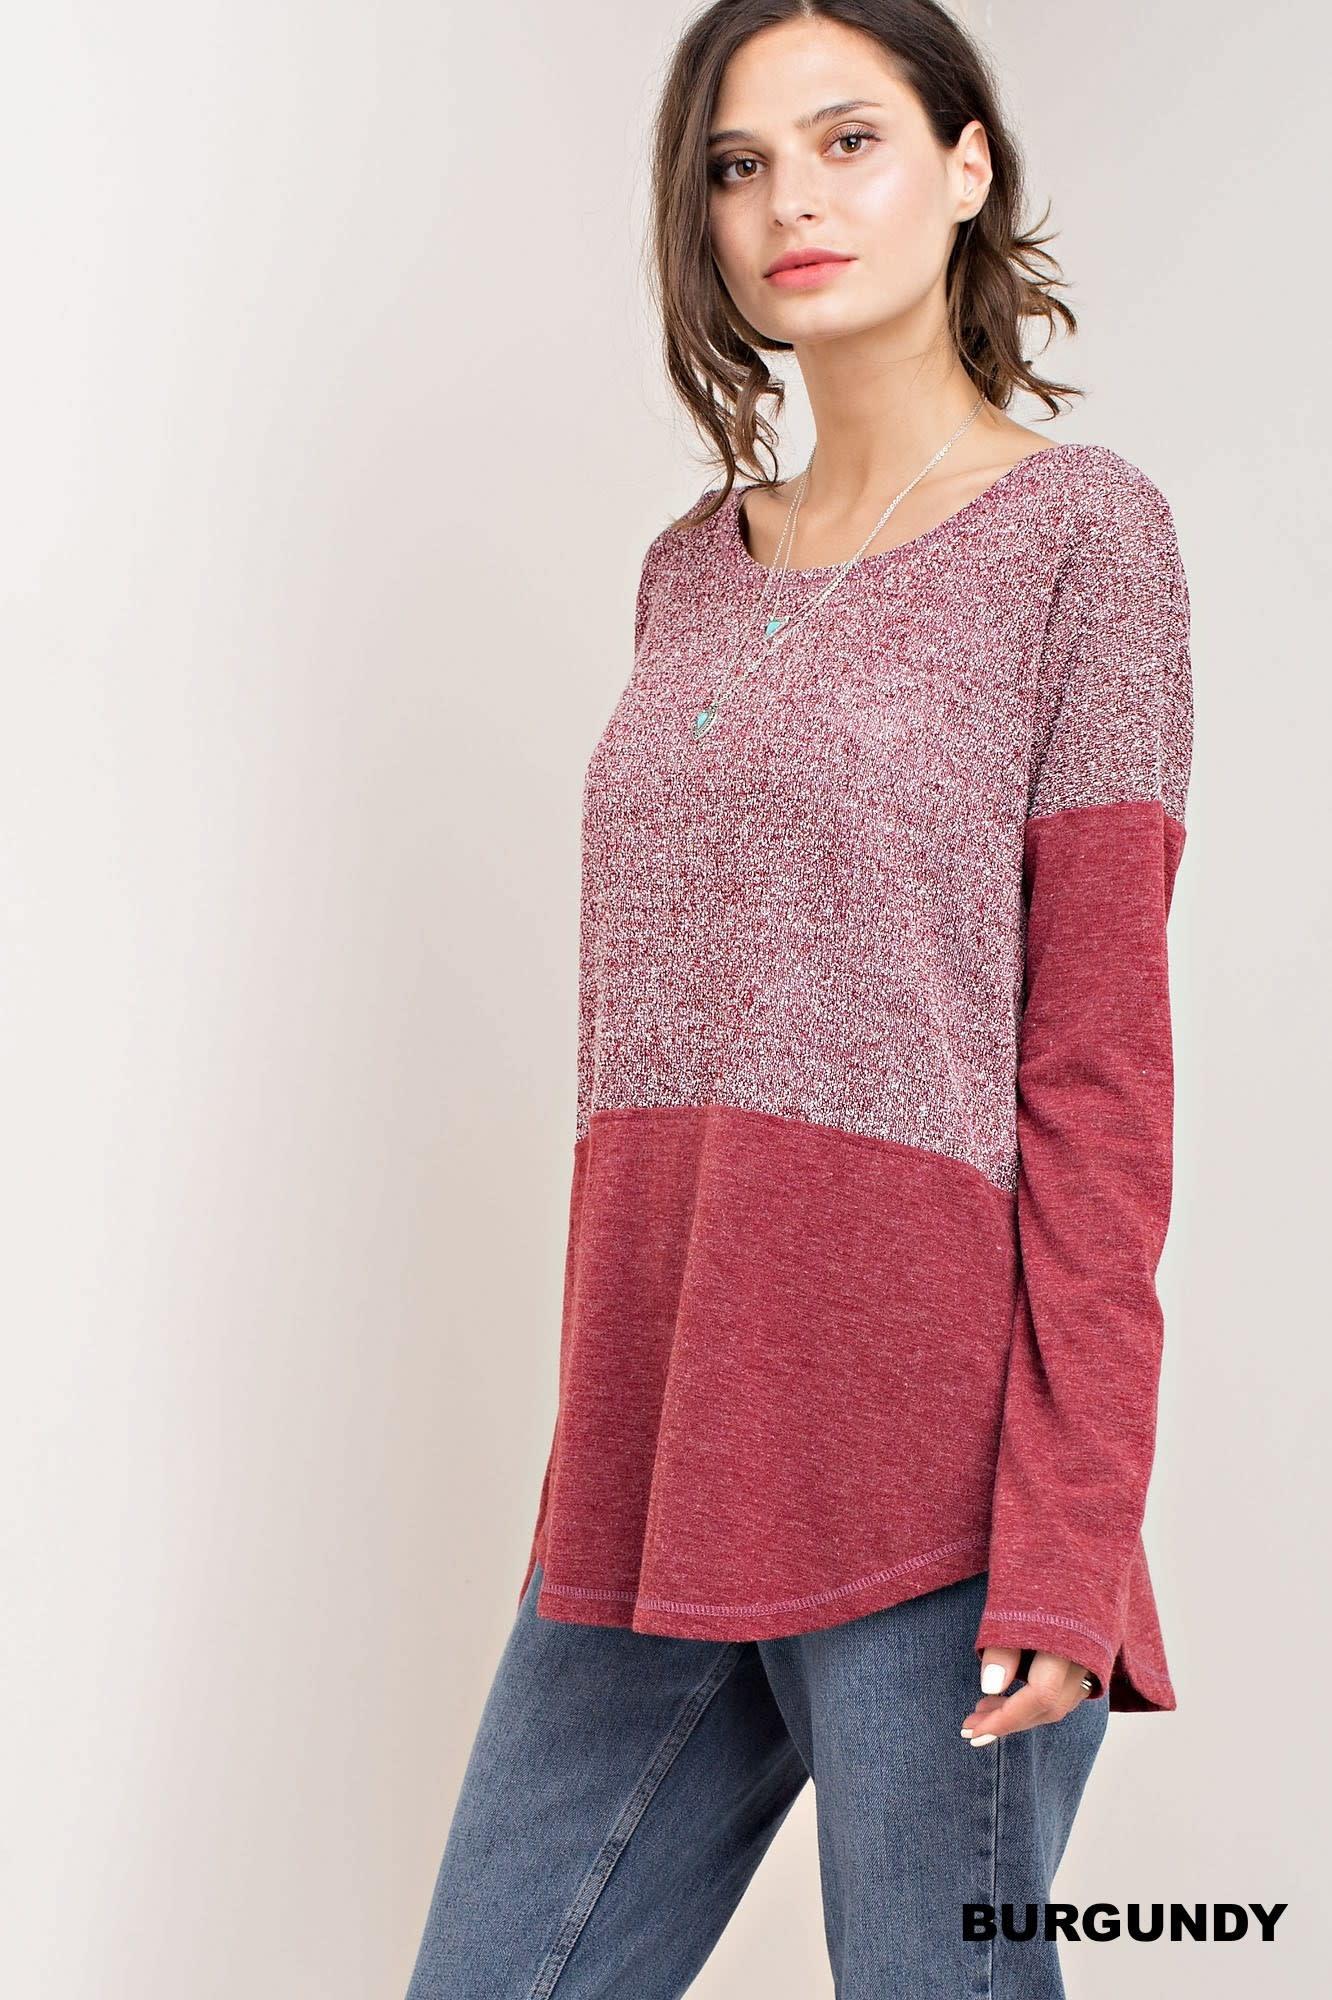 Fleurish Home Burgundy Mixed Knit Top